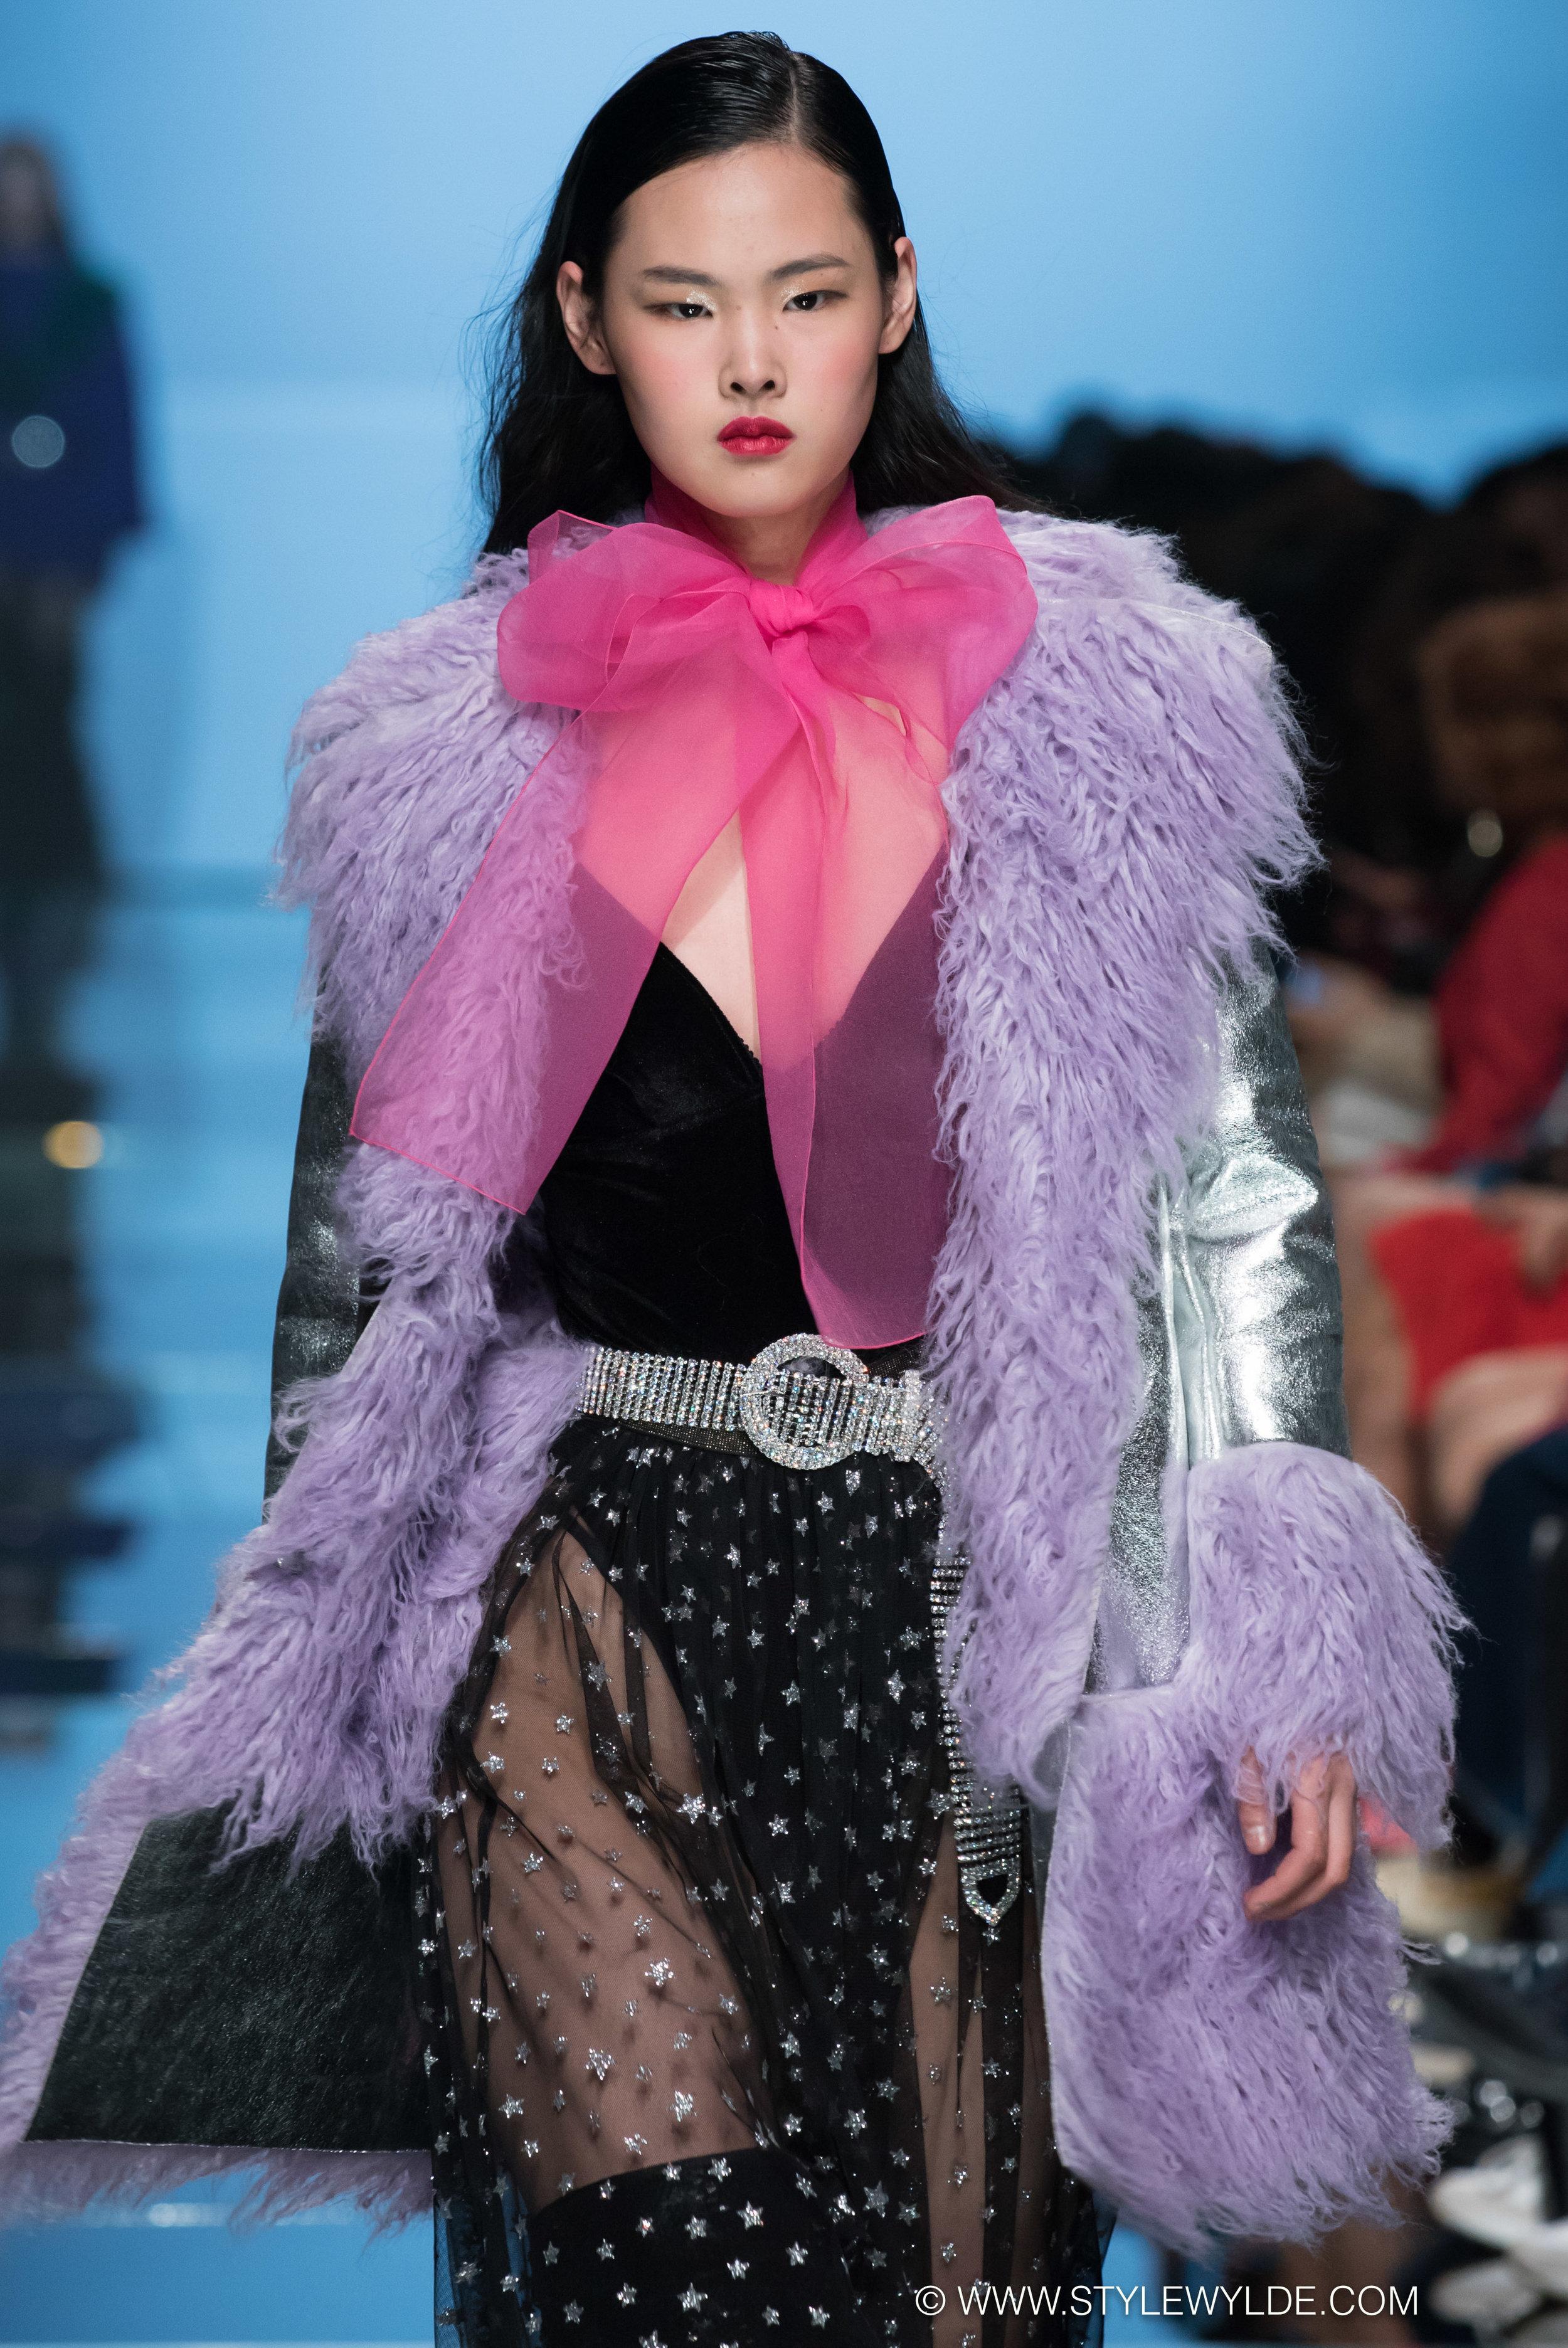 CynthiaHopeAnderson-HeraSeoul FashionWeekAW18-Lang&Lu-37.jpg